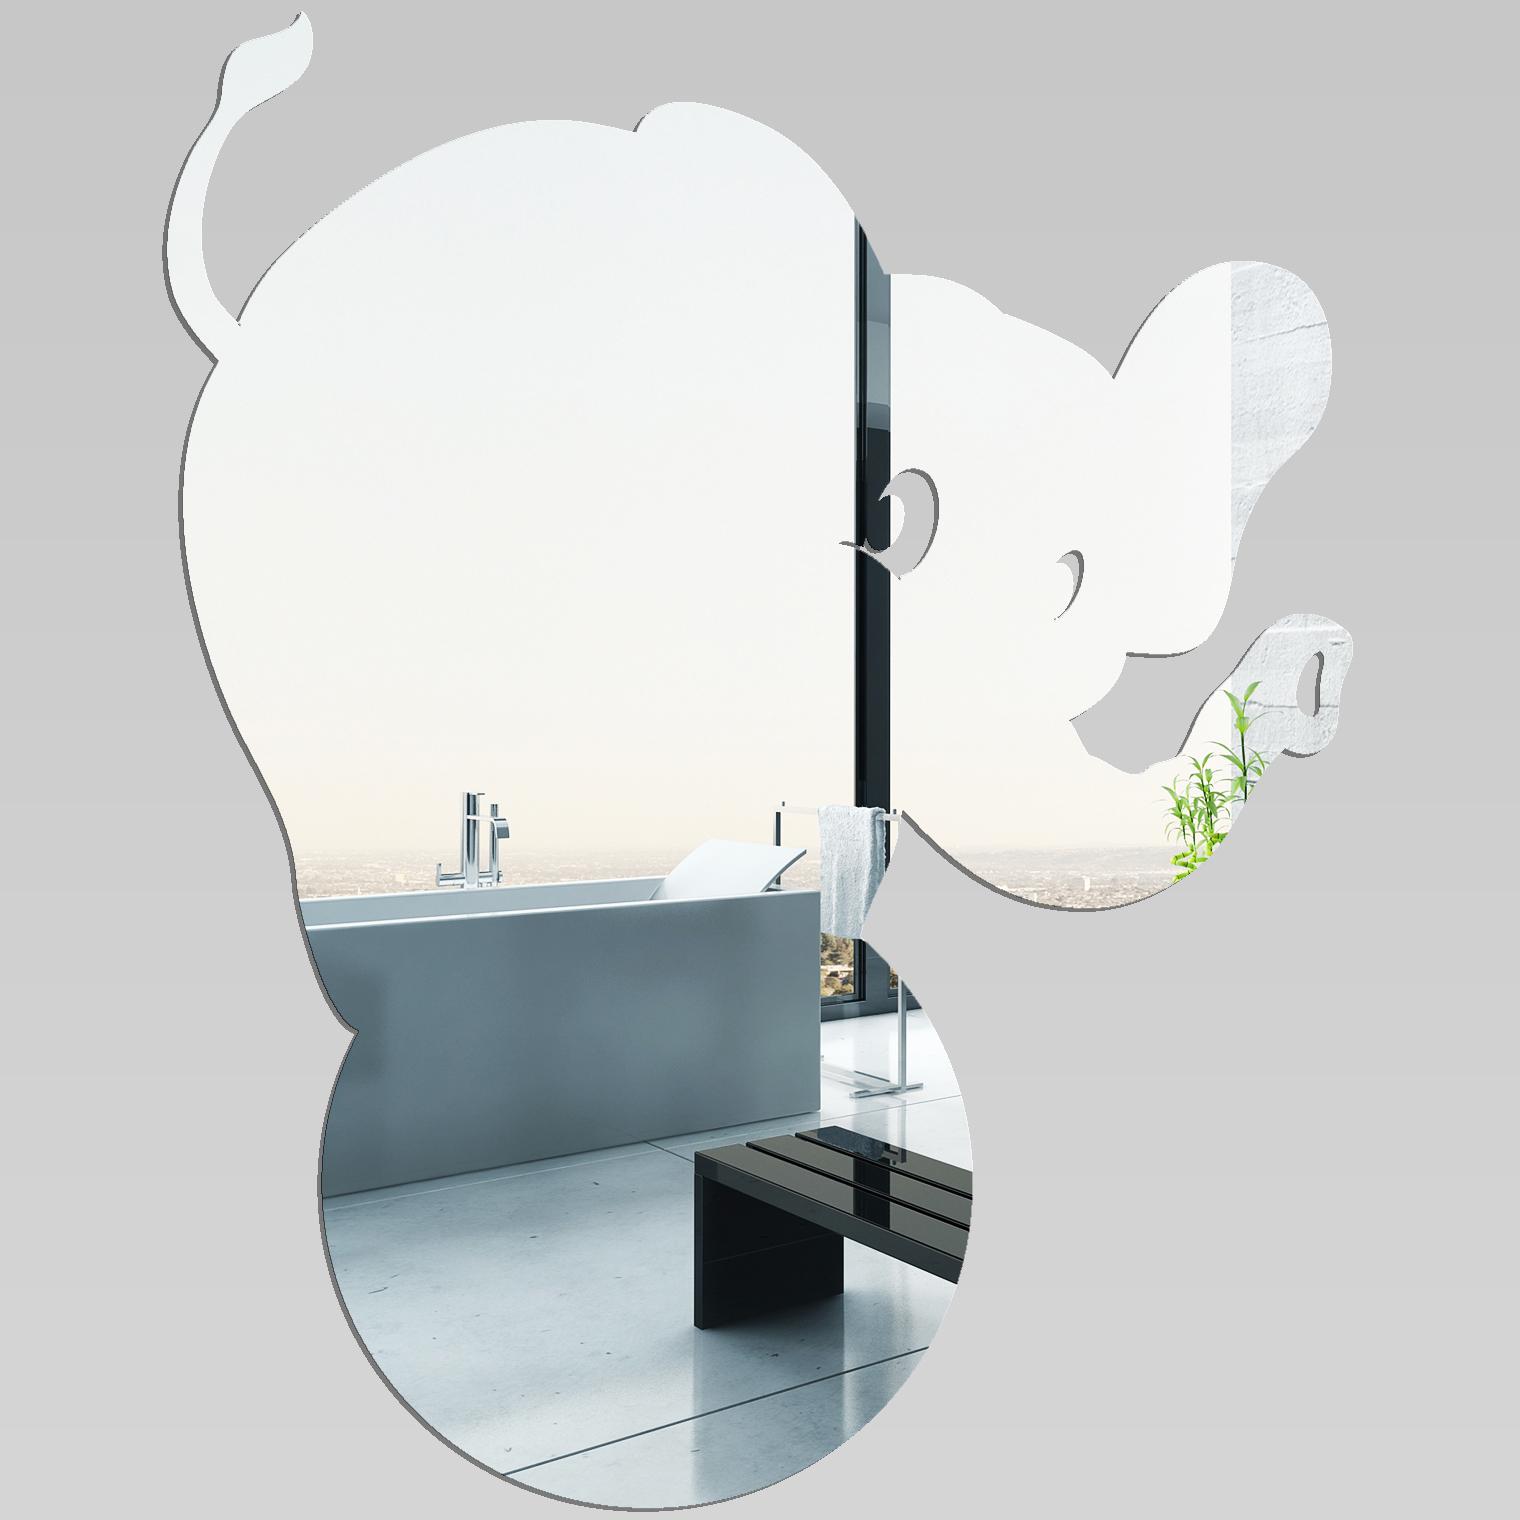 Miroir plexiglass acrylique el phant de cirque pas cher for Miroir 40x50